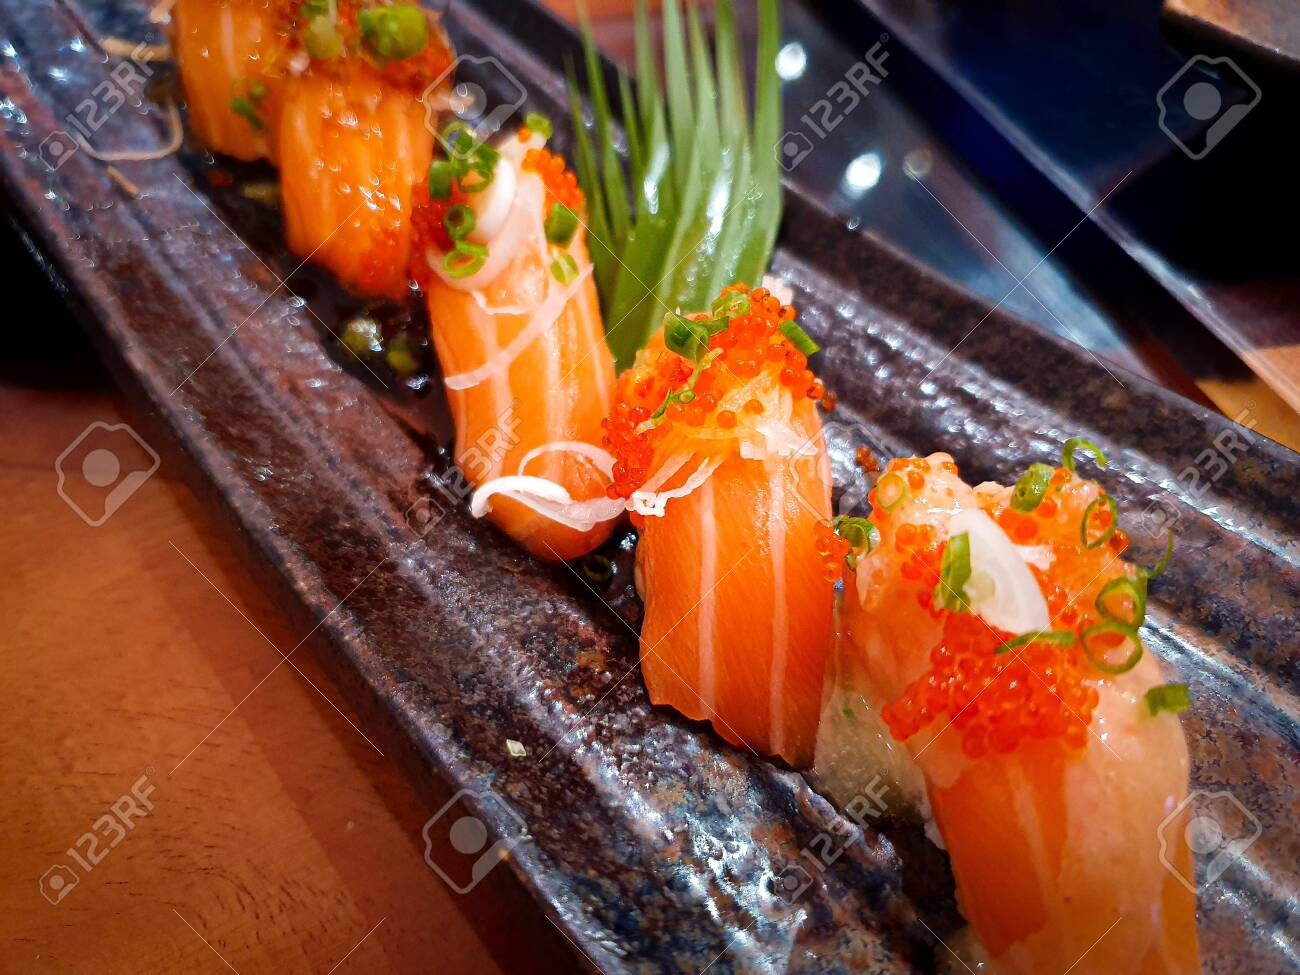 japanes food Sushi Salmon on dish - 133097587